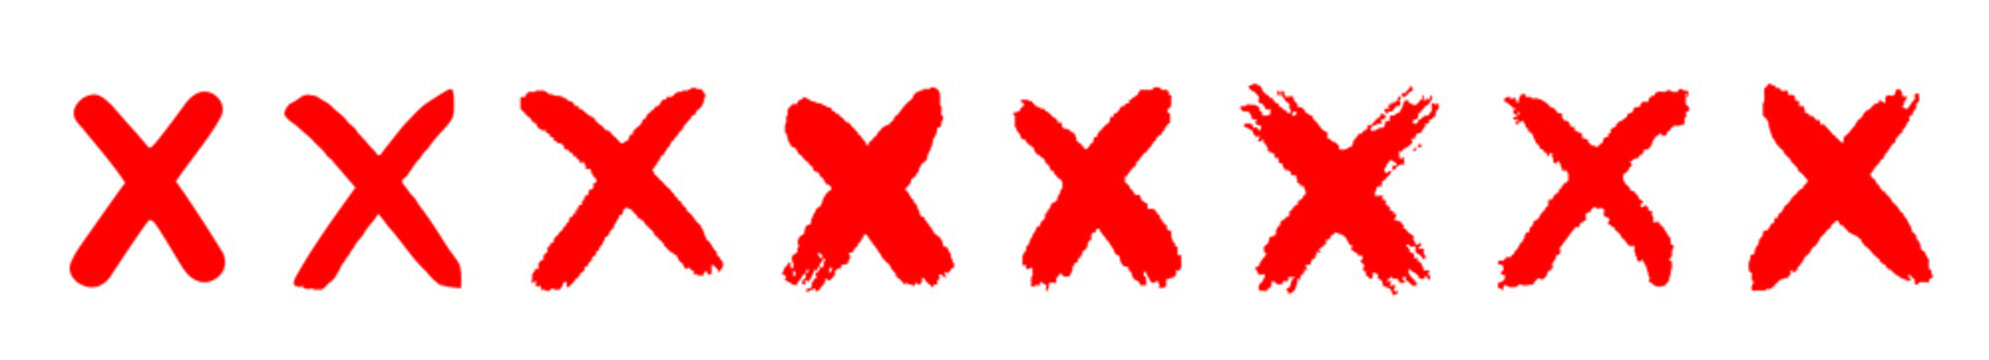 mark vector. mark icon. mark sign. mark symbol